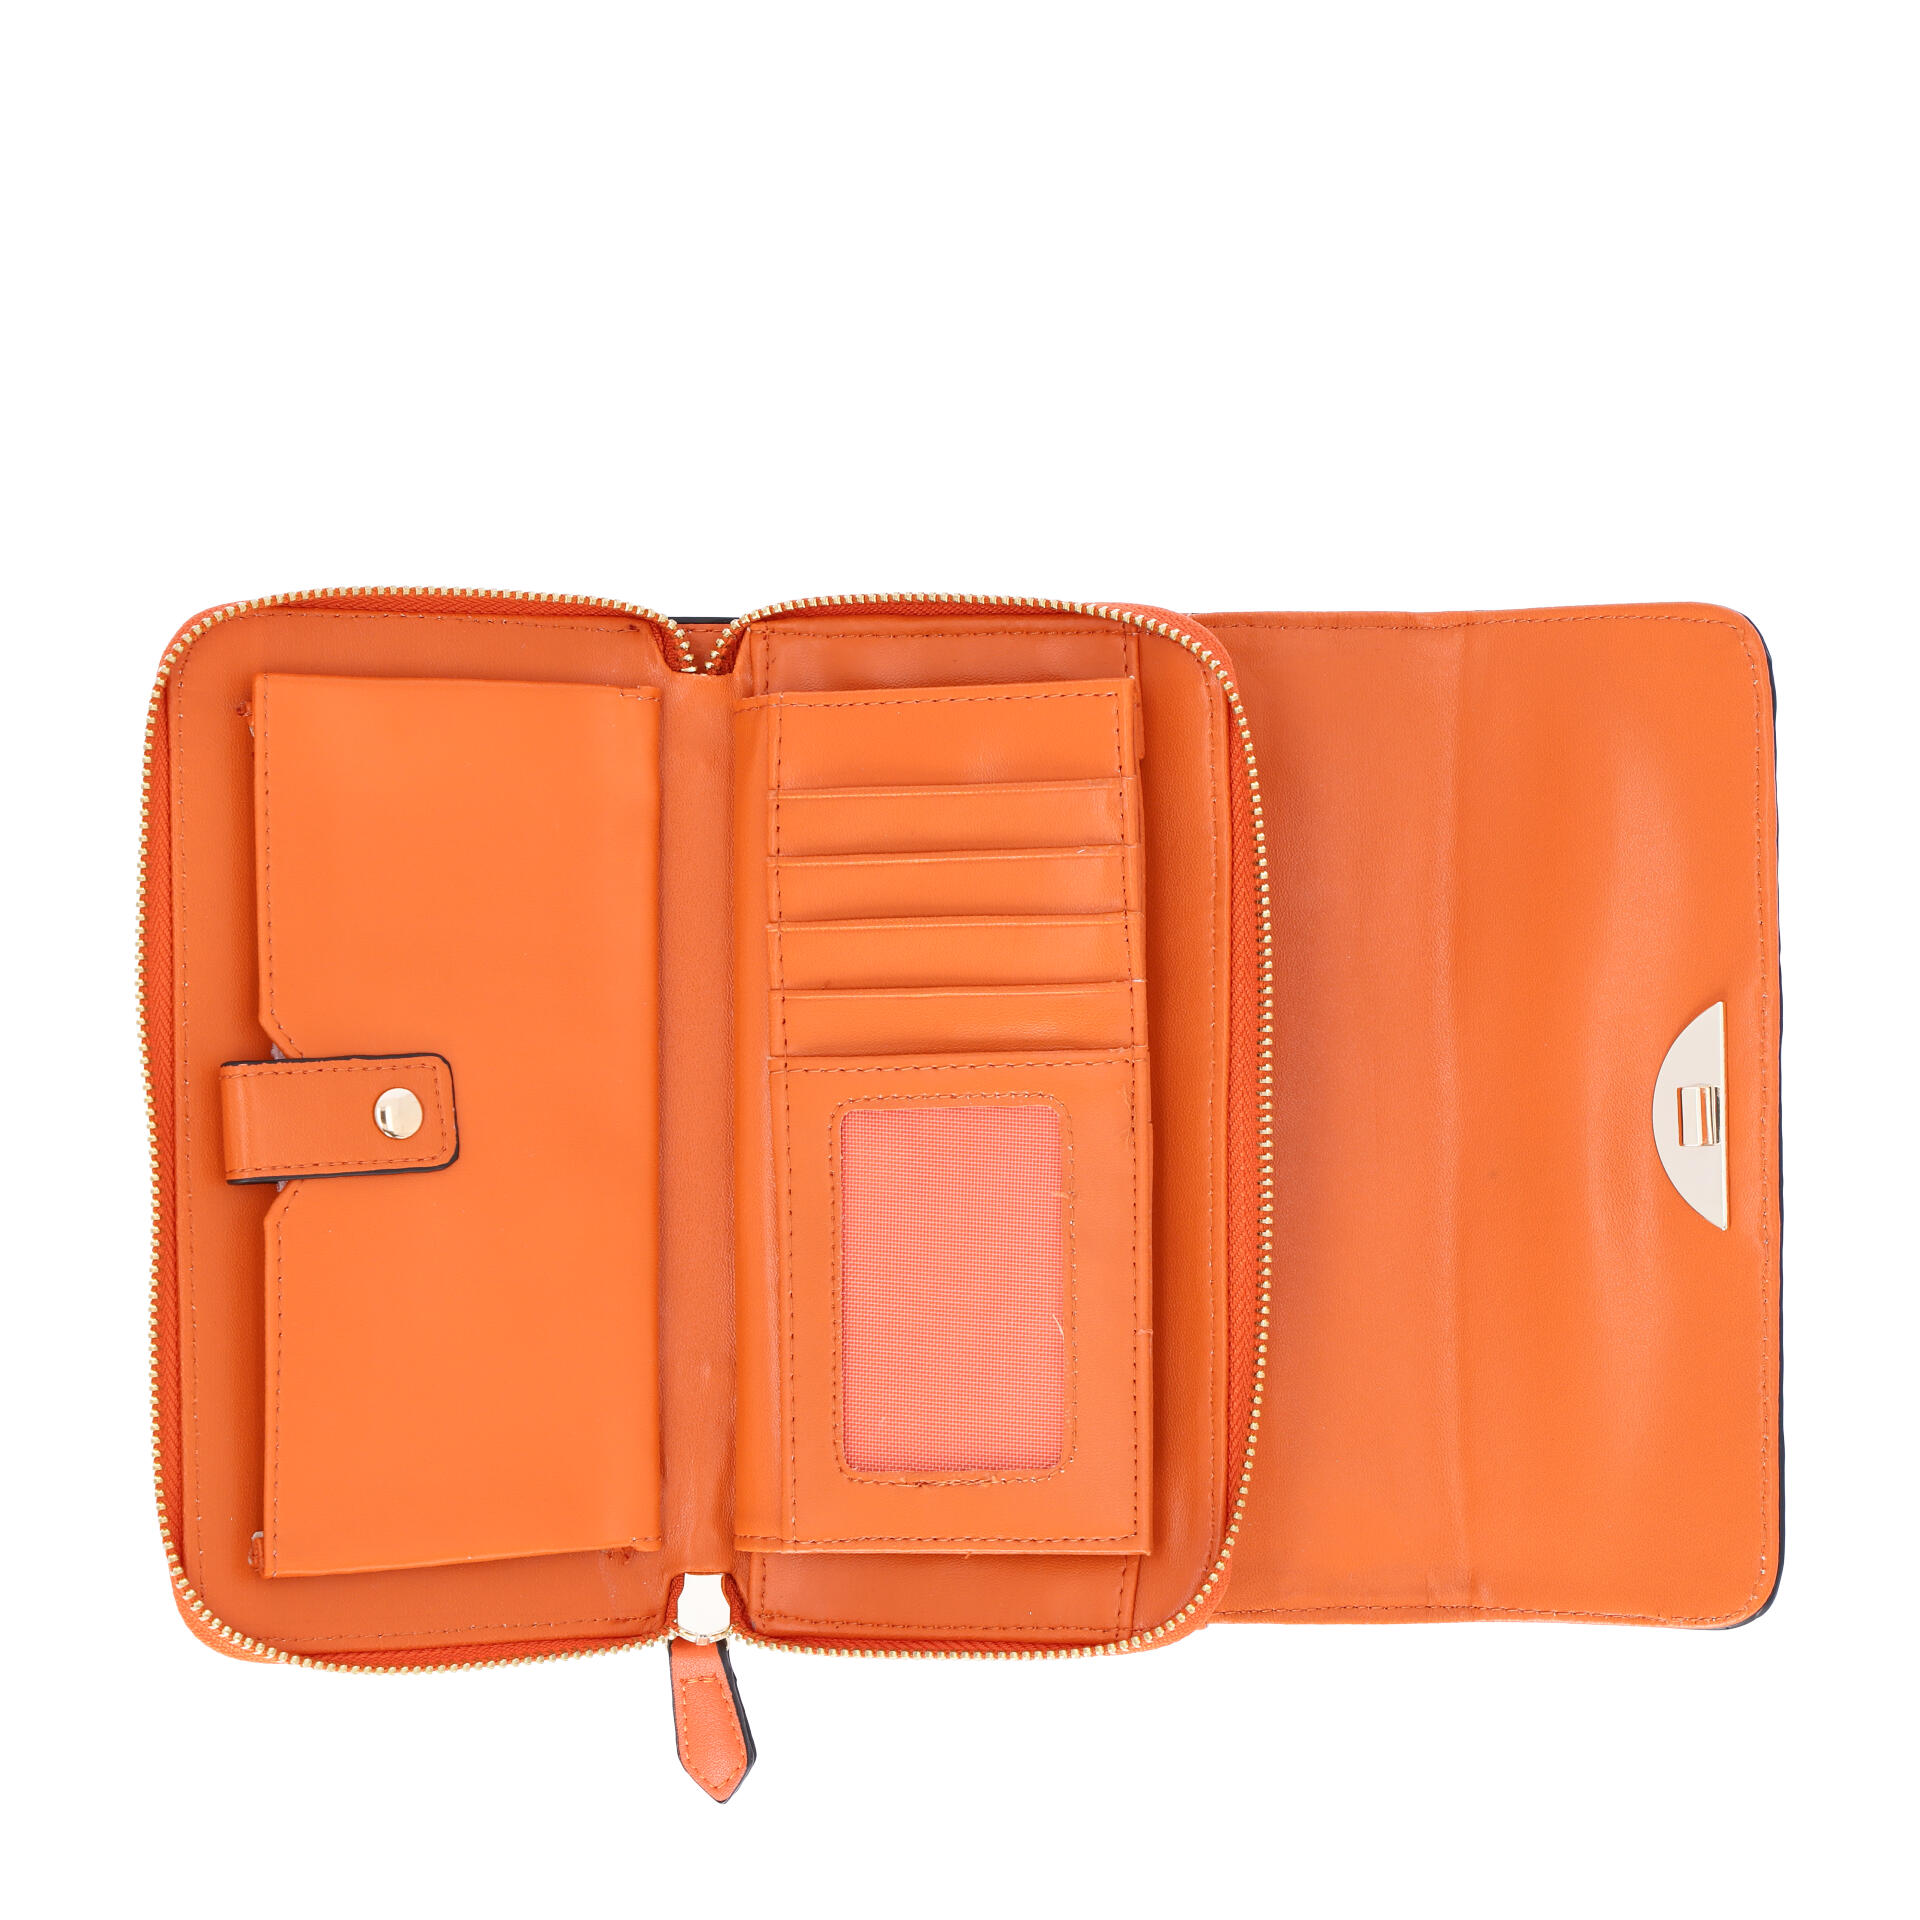 Valentino by Mario Valentino Falcor Wallet on a Chain arancio